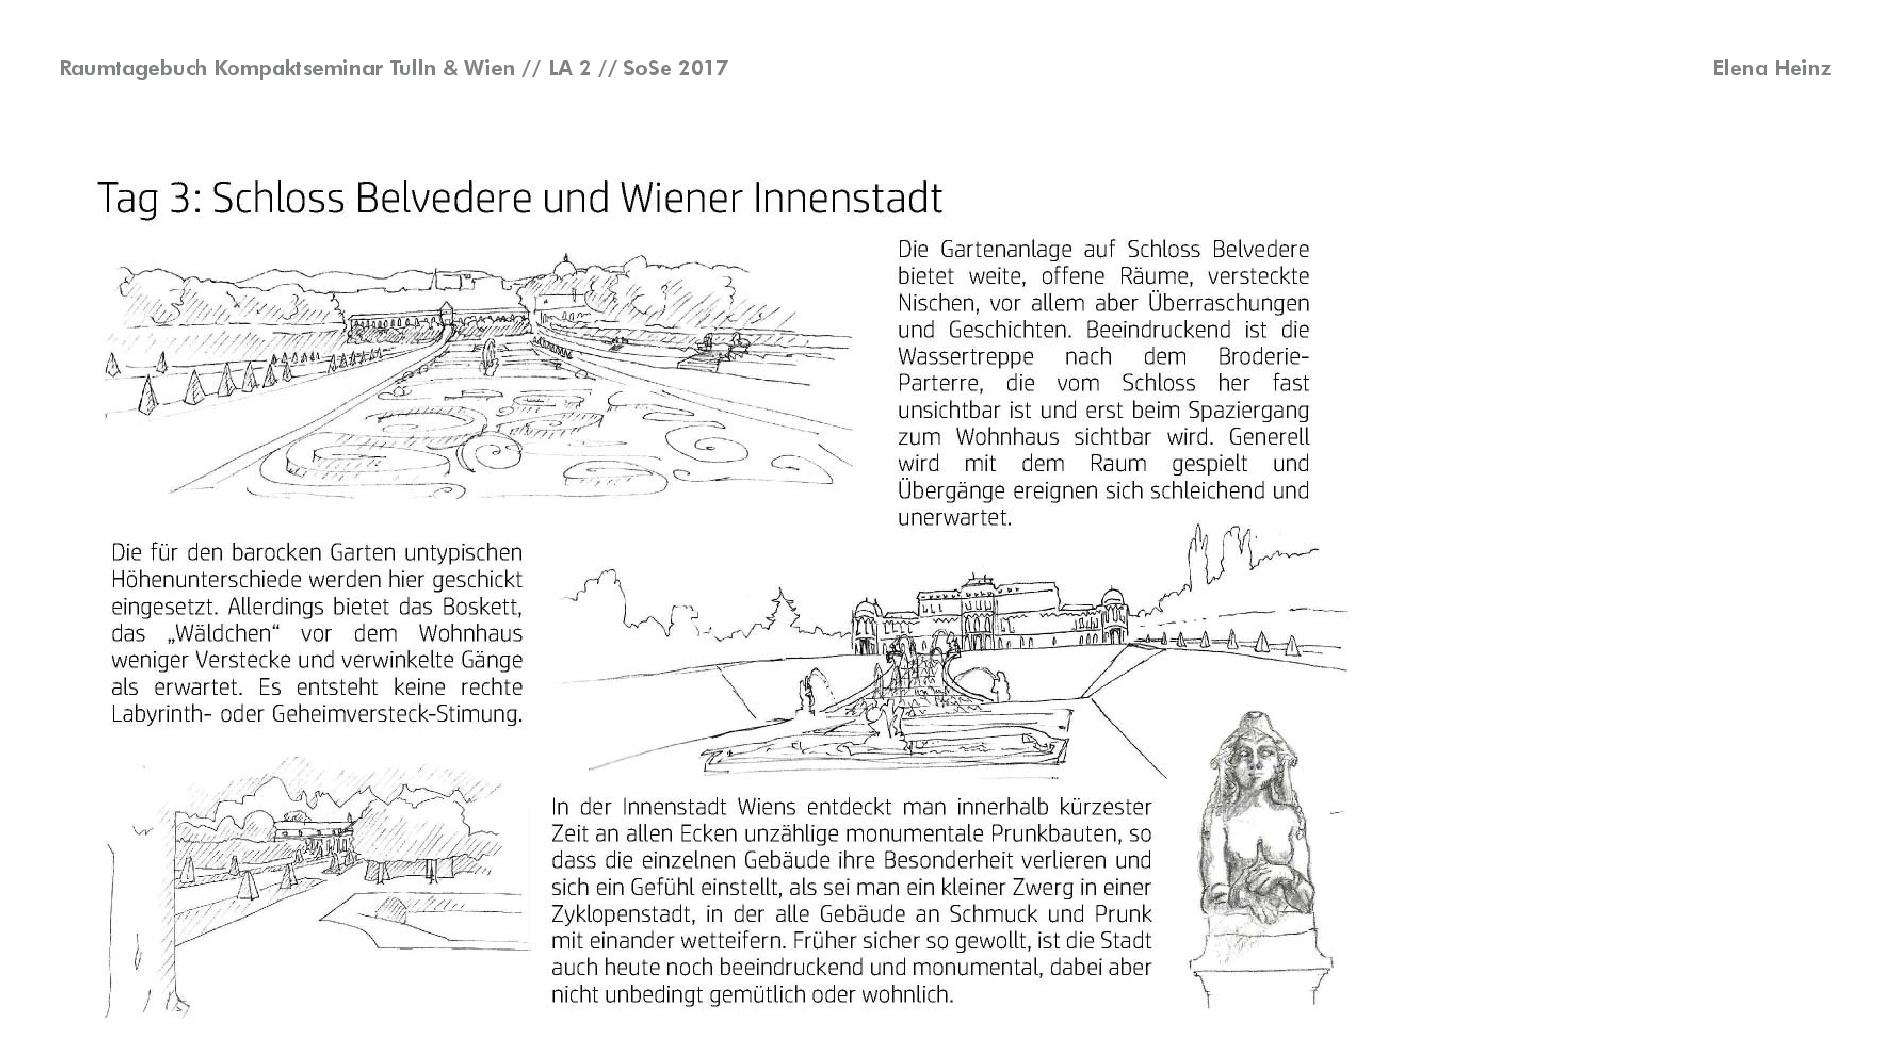 NEU Screen Raumtagebuch Tulln Wien SoSe 17 019